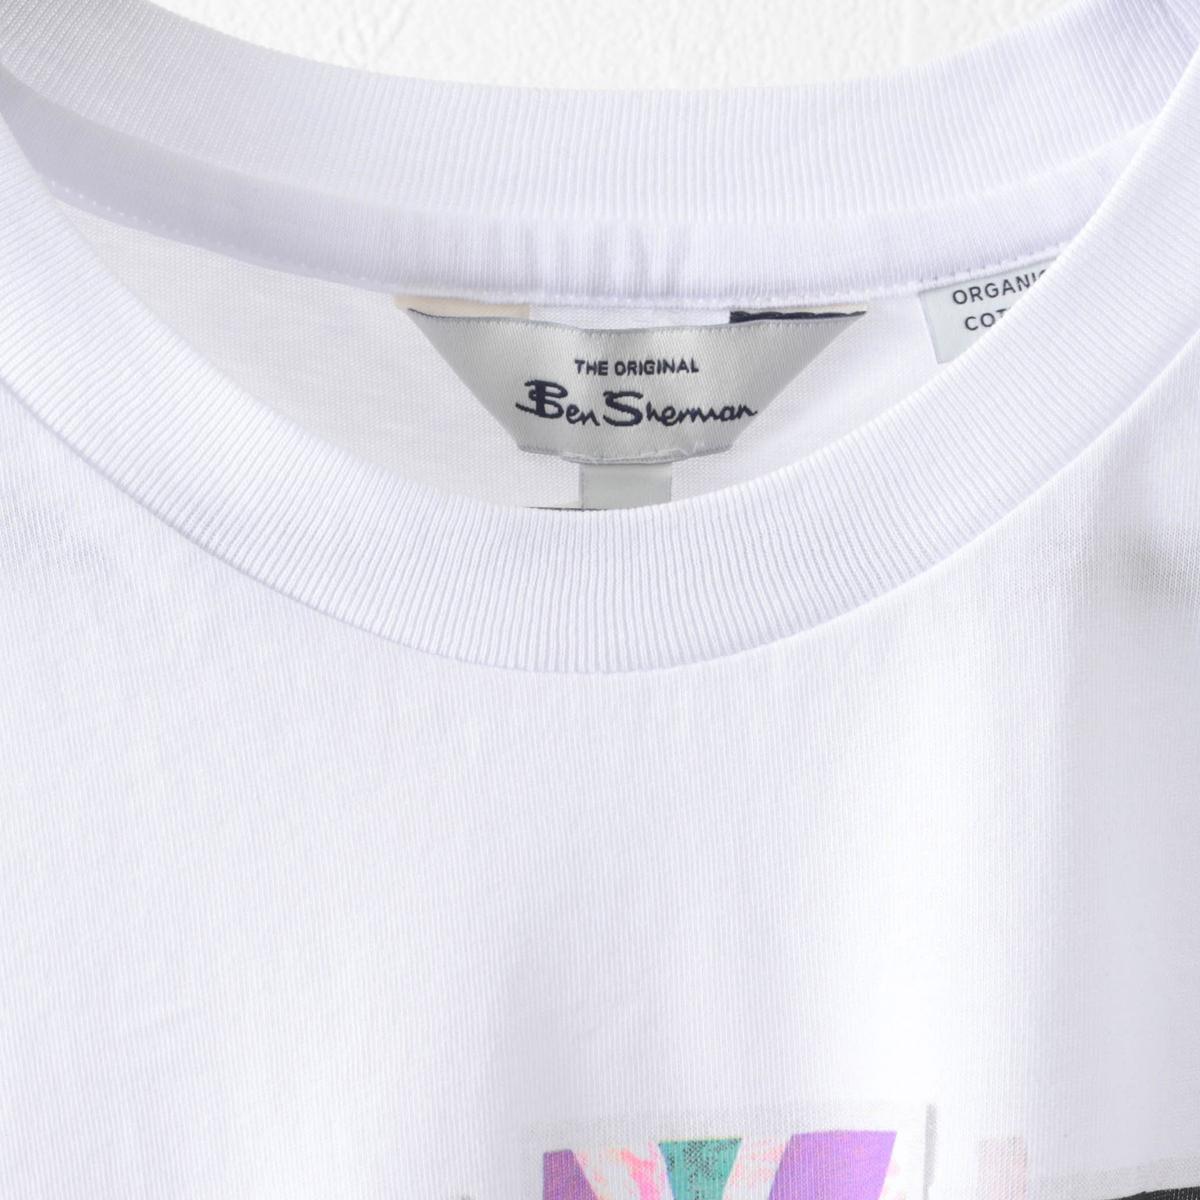 Ben Sherman ベンシャーマン メンズ Tシャツ フォトスタックプリント 2色 シー ホワイト オーガニックコットン レギュラーフィット